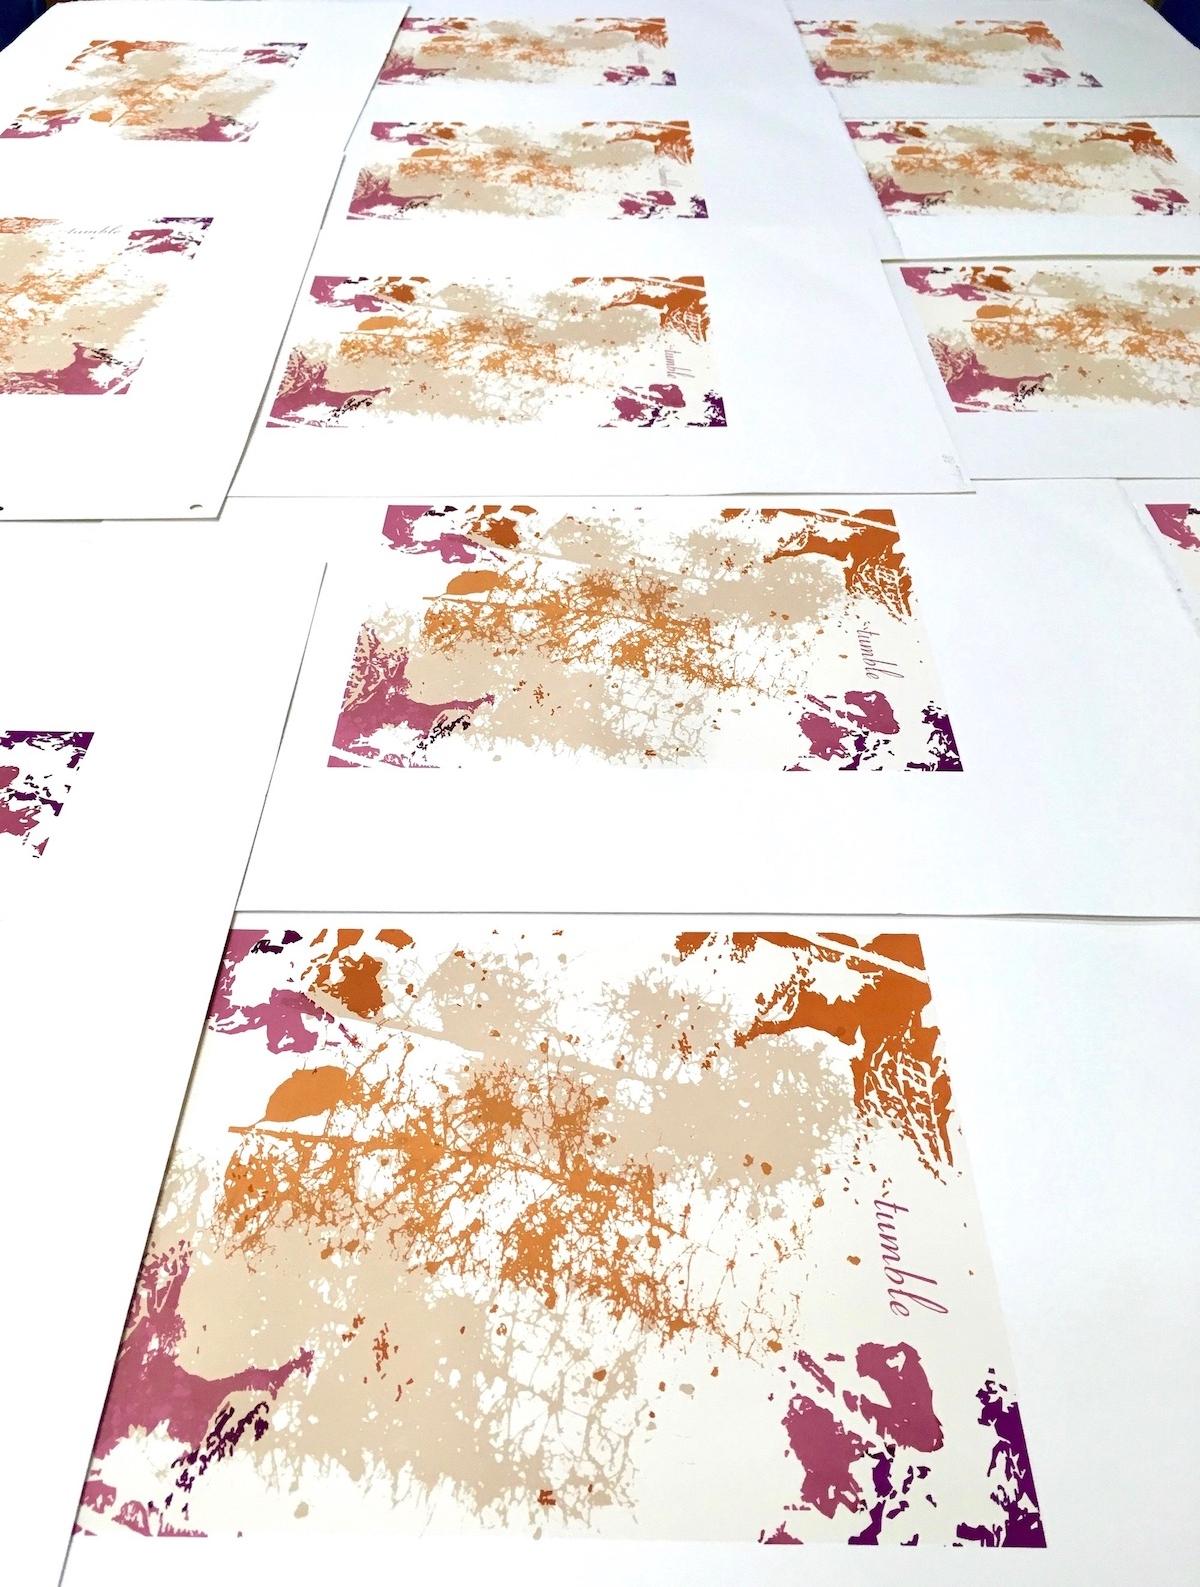 "Limited Edition & Unique Fine Art Prints - ""float, tumble, drift"" is an 8.5"" x 11"" screenprint on Arches 88"